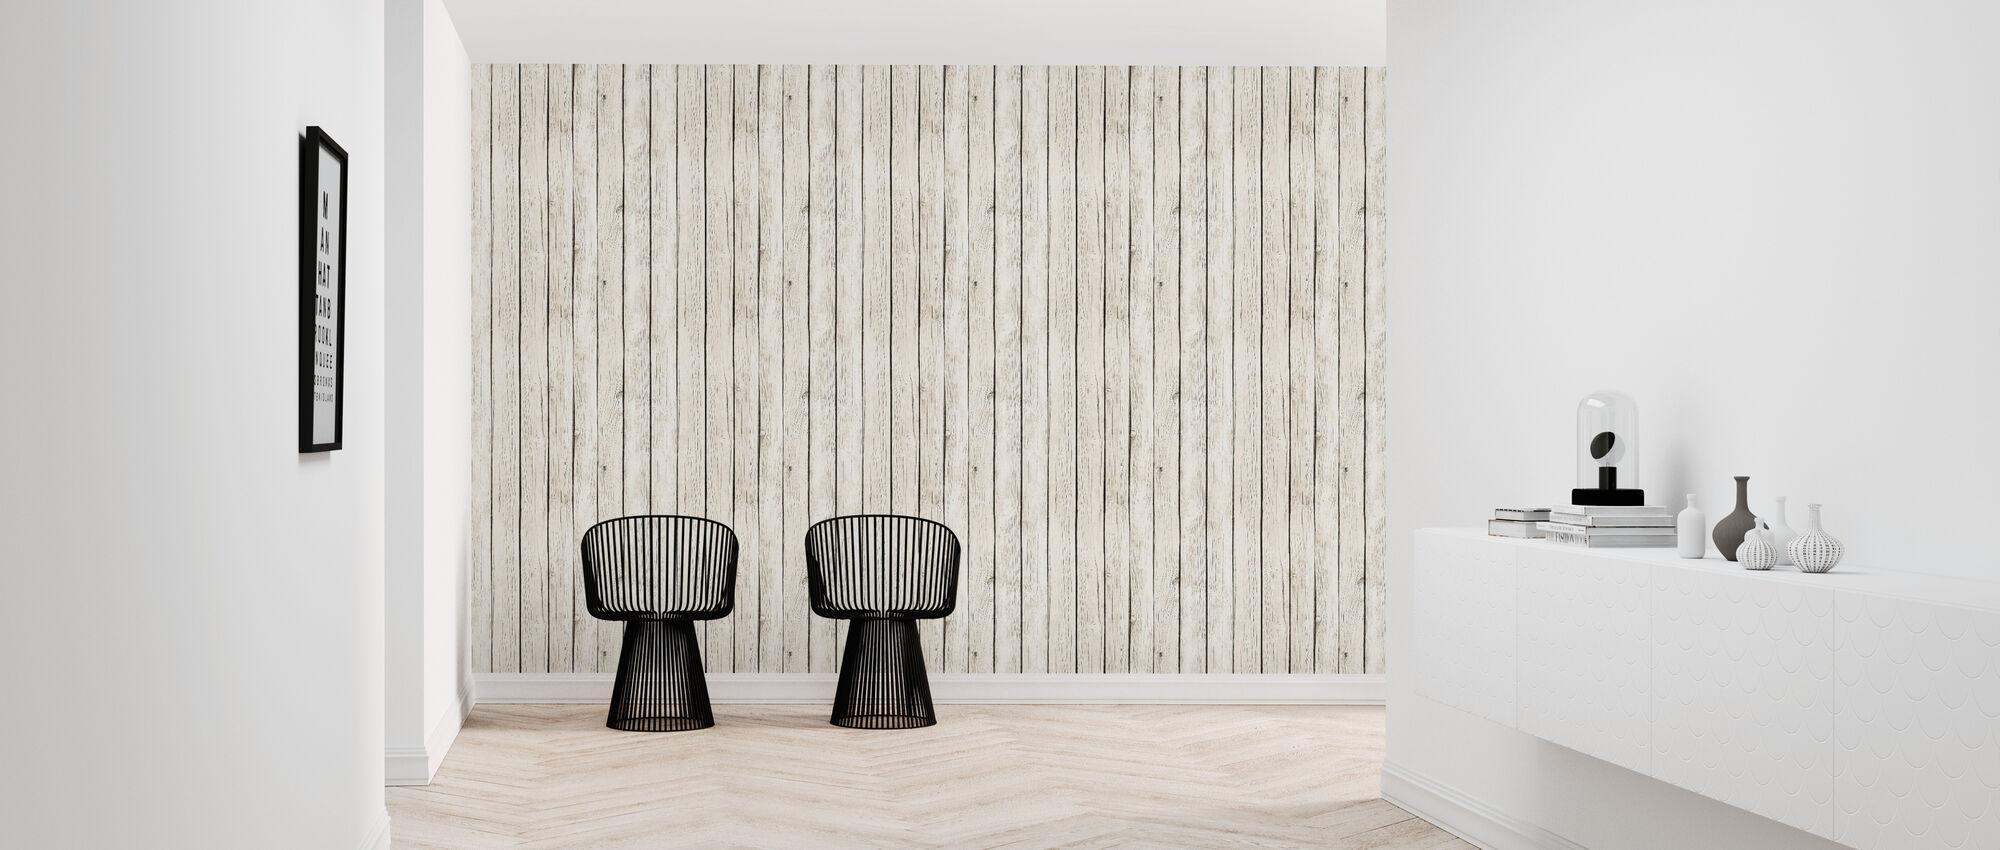 Board Wall - Wallpaper - Hallway